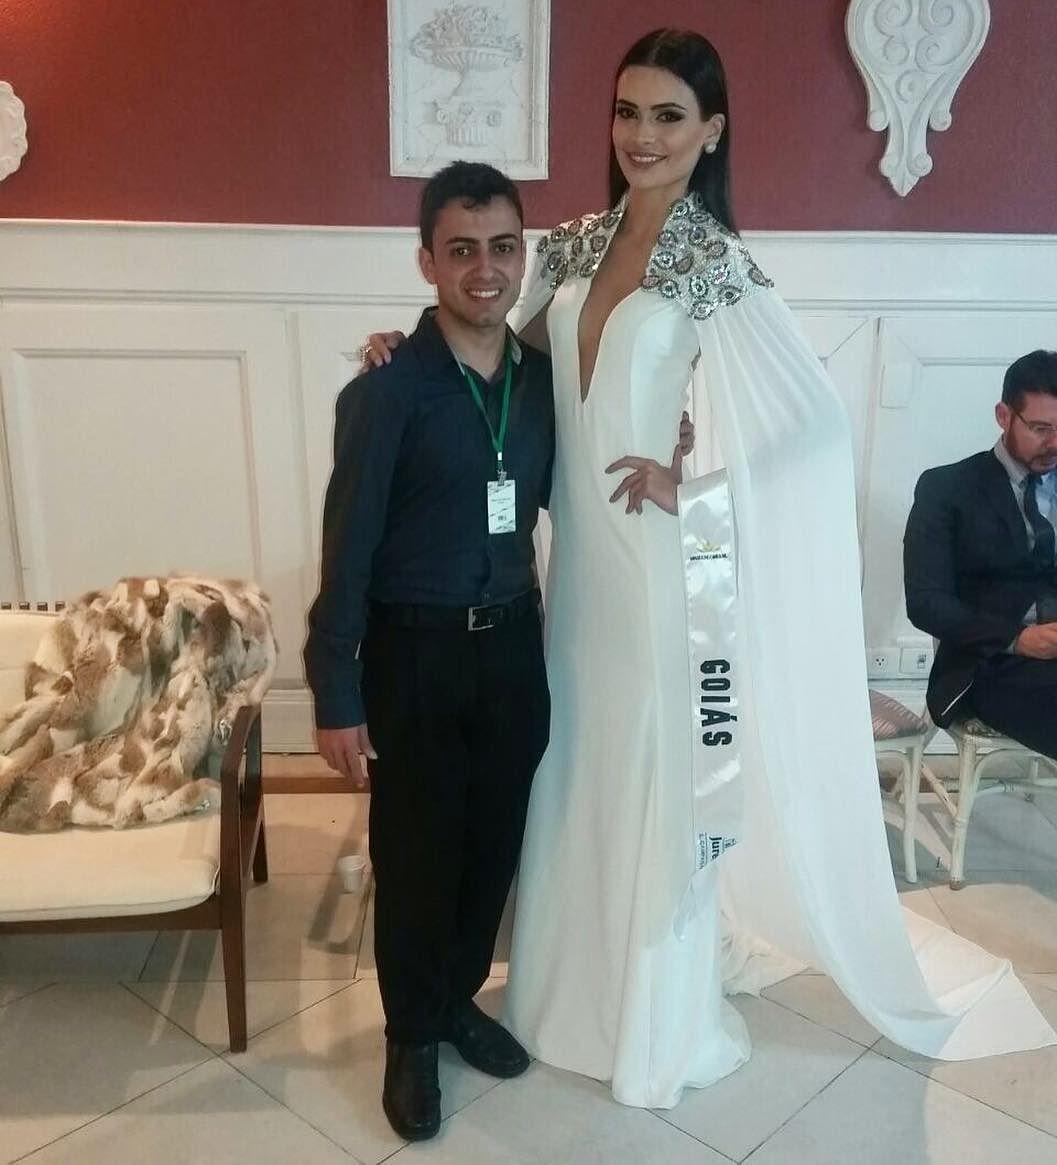 beatrice fontoura, top 10 de miss world 2016. - Página 3 Jurkps6w